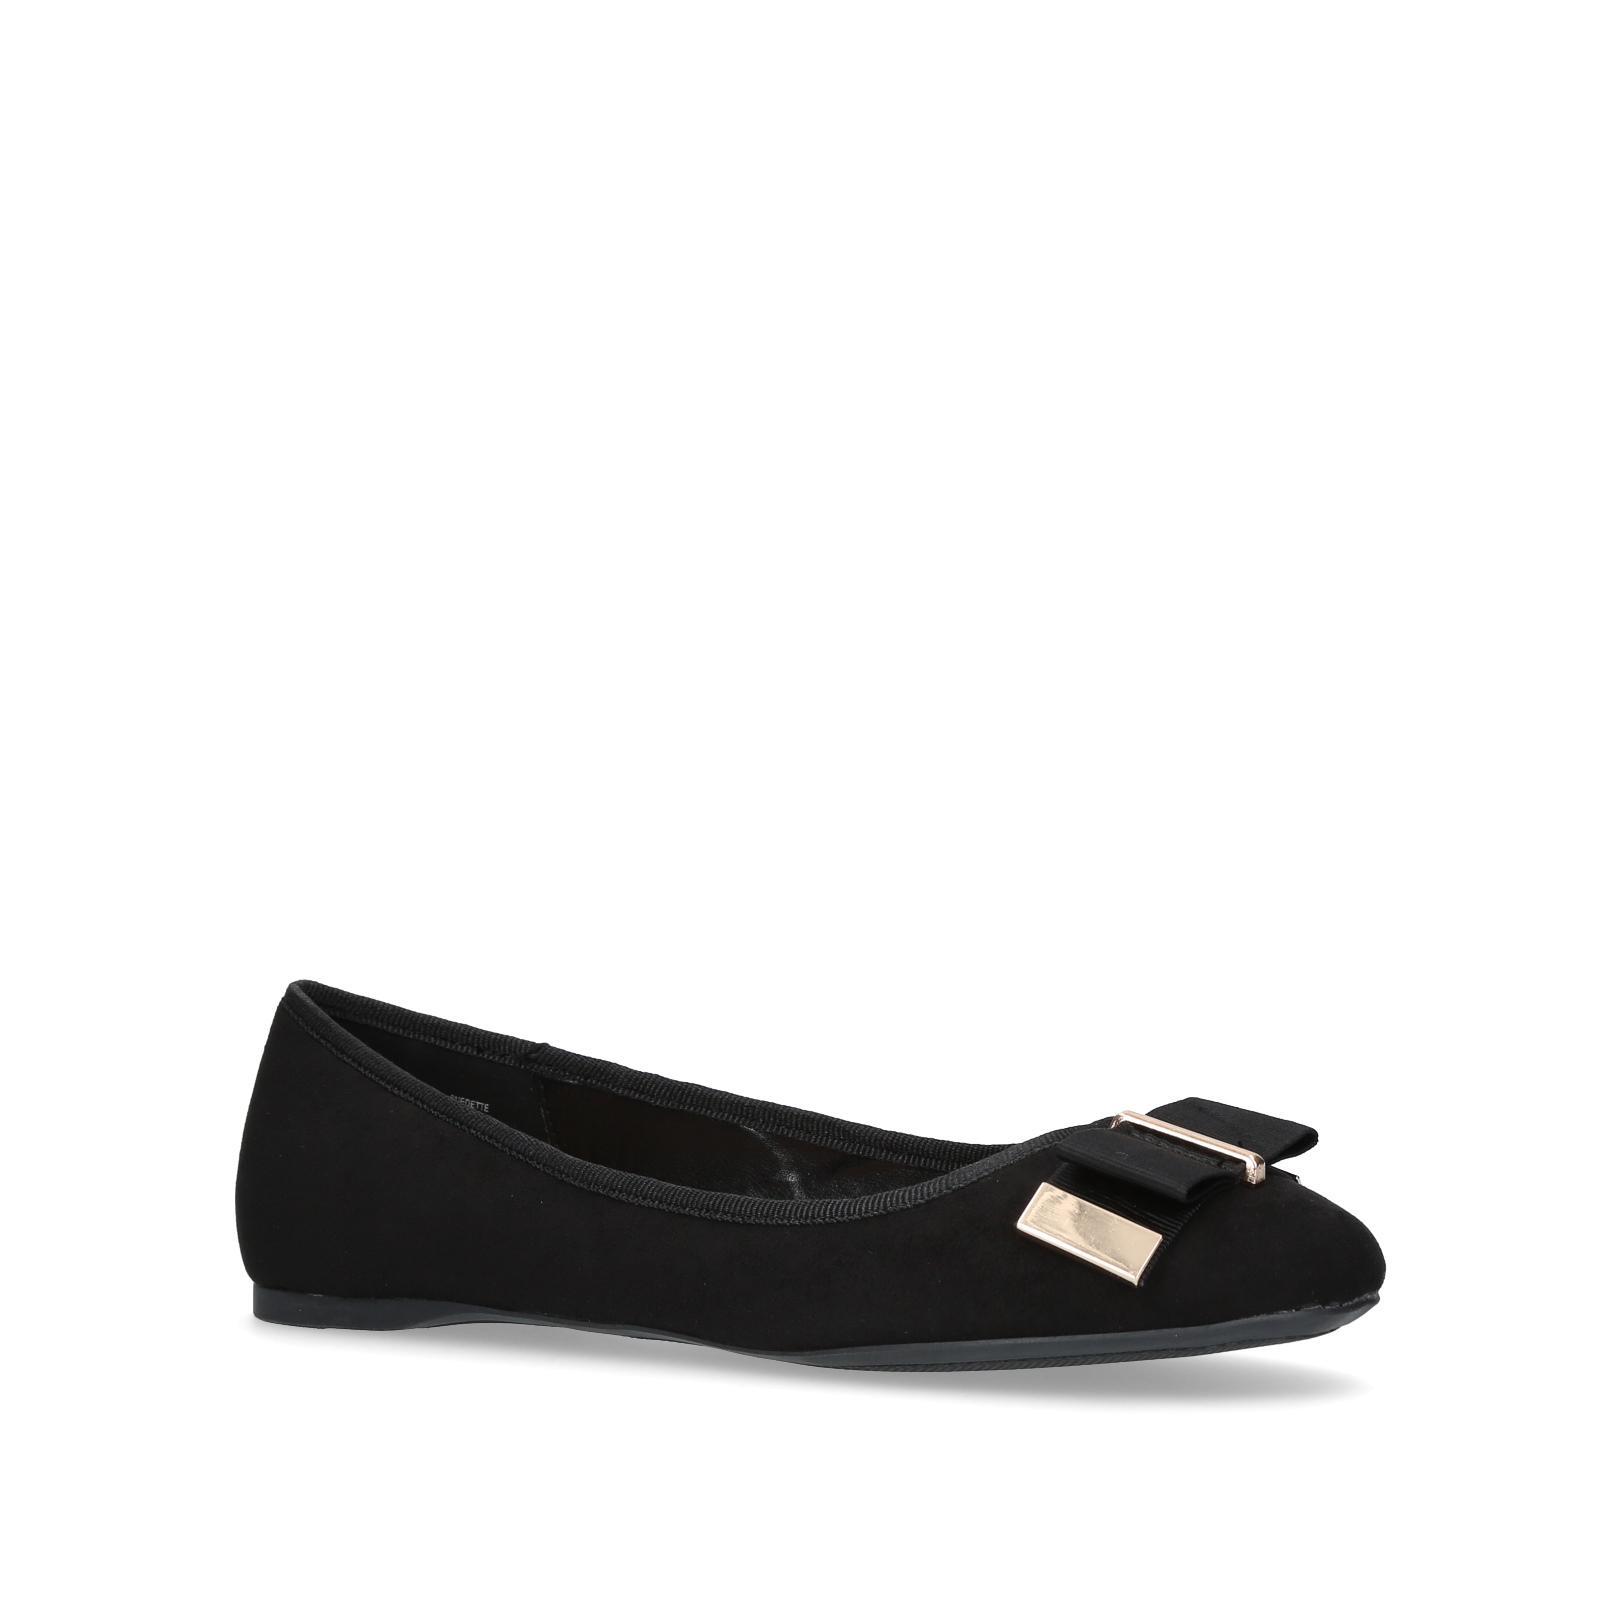 Kurt Geiger Kold Shoe Black